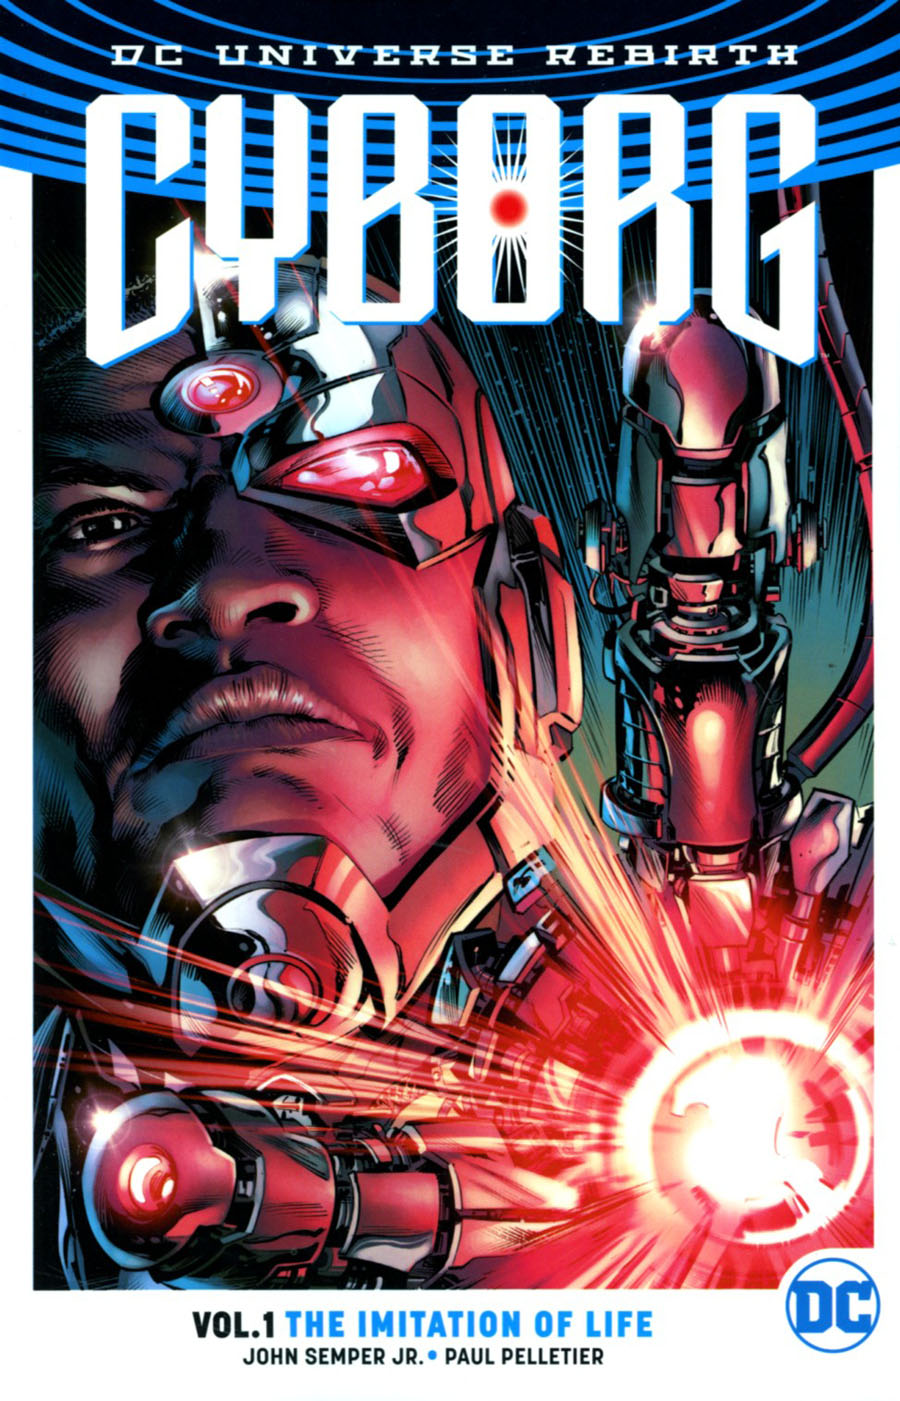 Cyborg (Rebirth) Vol 1 The Imitation Of Life TP